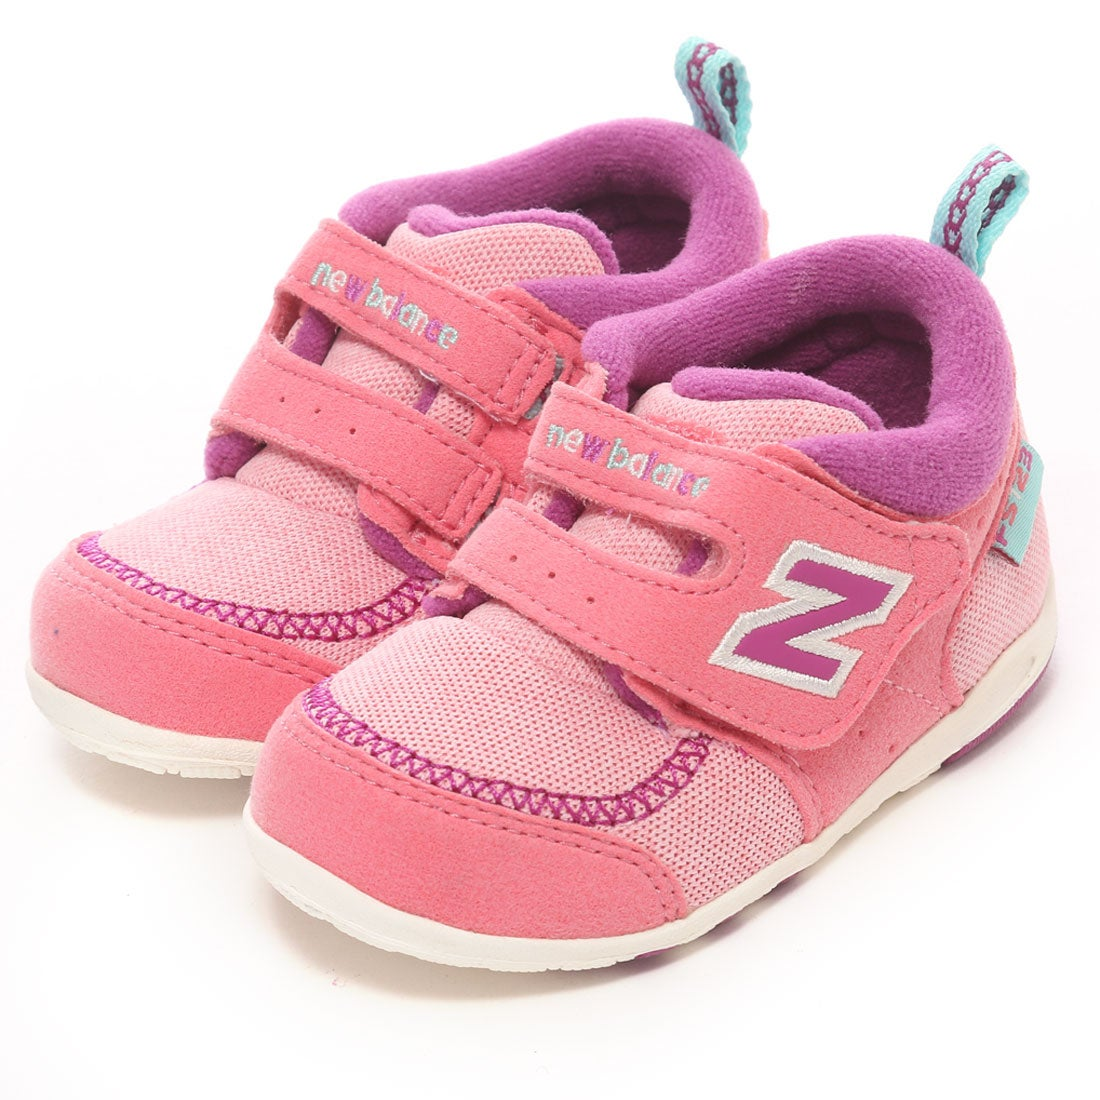 SHOE・PLAZA ニューバランス new balance ベビーシューズ FS123MCI (ピンク) ,靴とファッションの通販サイト ロコンド